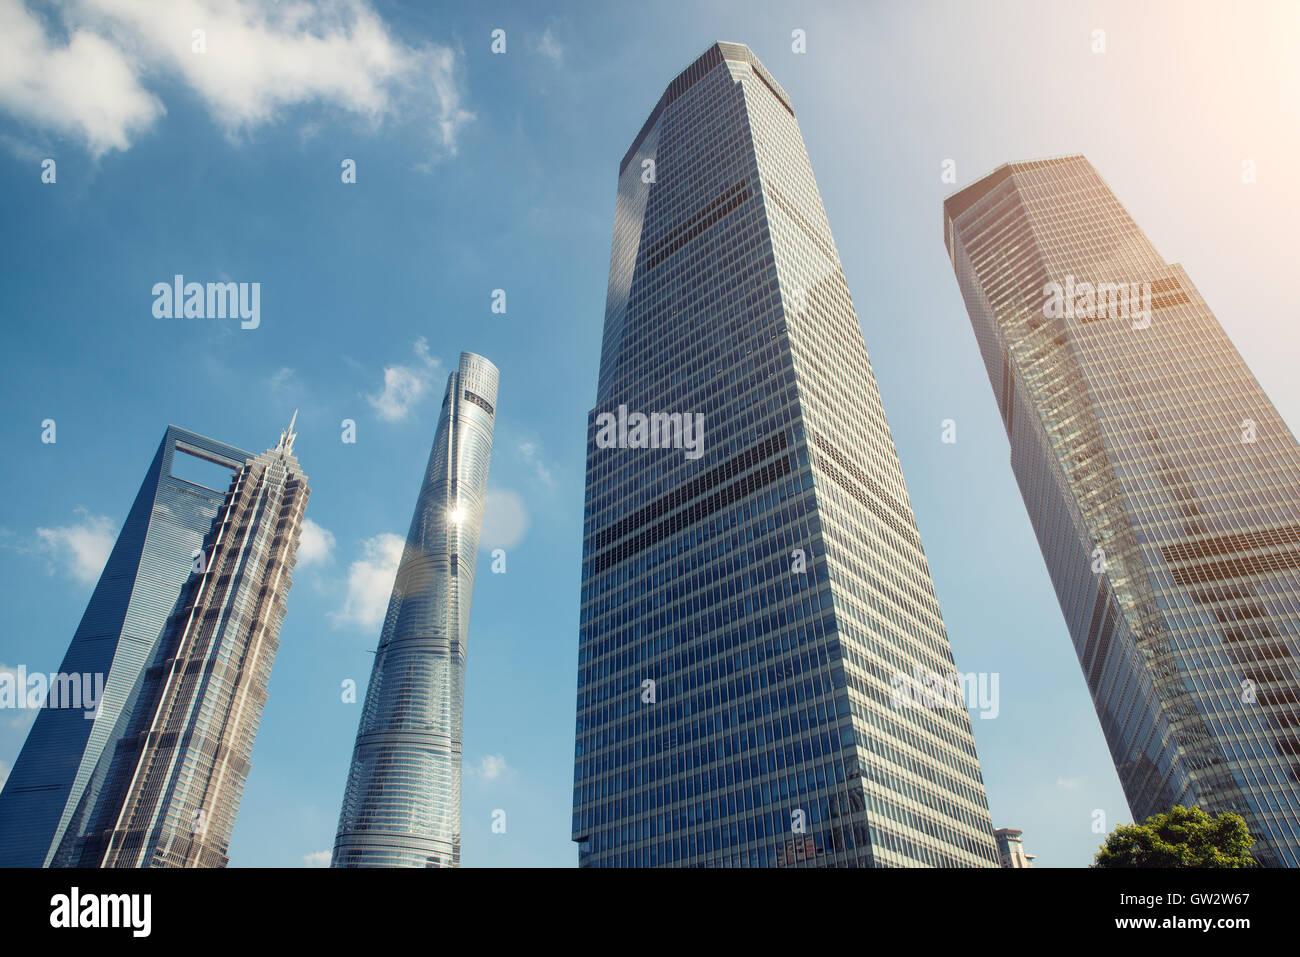 Shanghai skyscraper in Lujiazui Shanghai financial district in Shanghai, China. - Stock Image